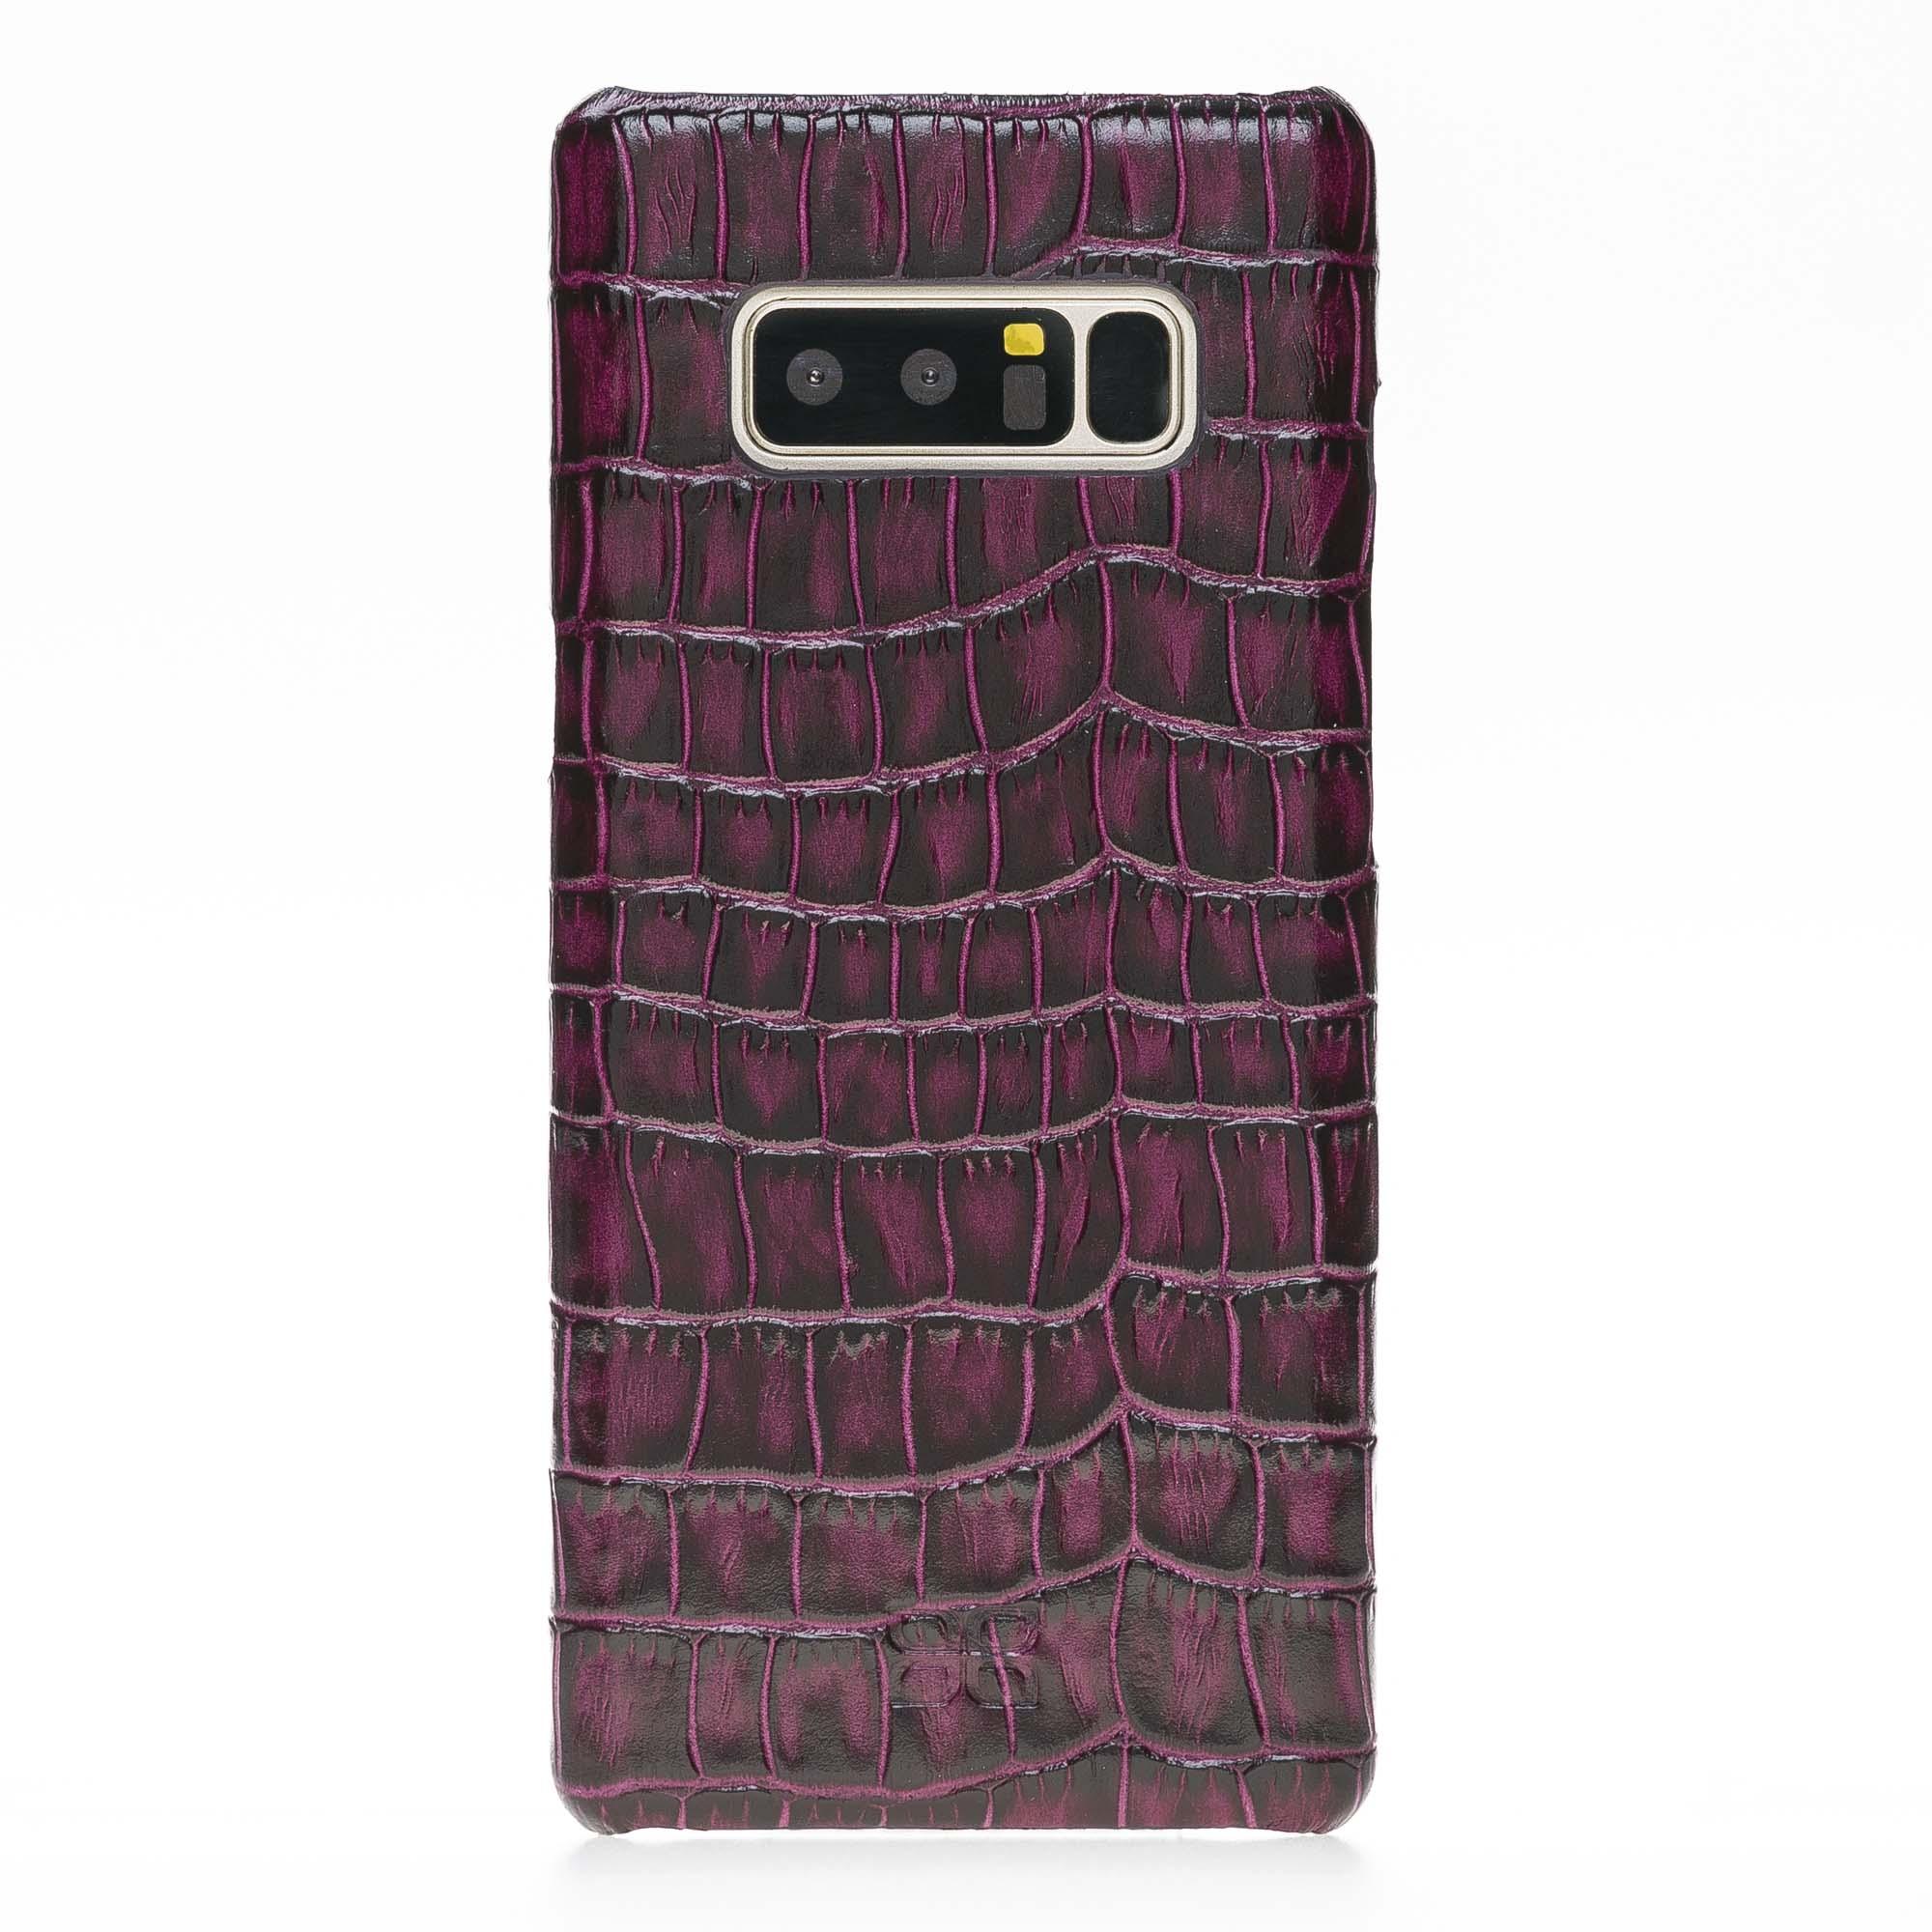 Чехол Ultimate Jacket Bouletta Фиолетовый YK02 для Samsung Galaxy note 8